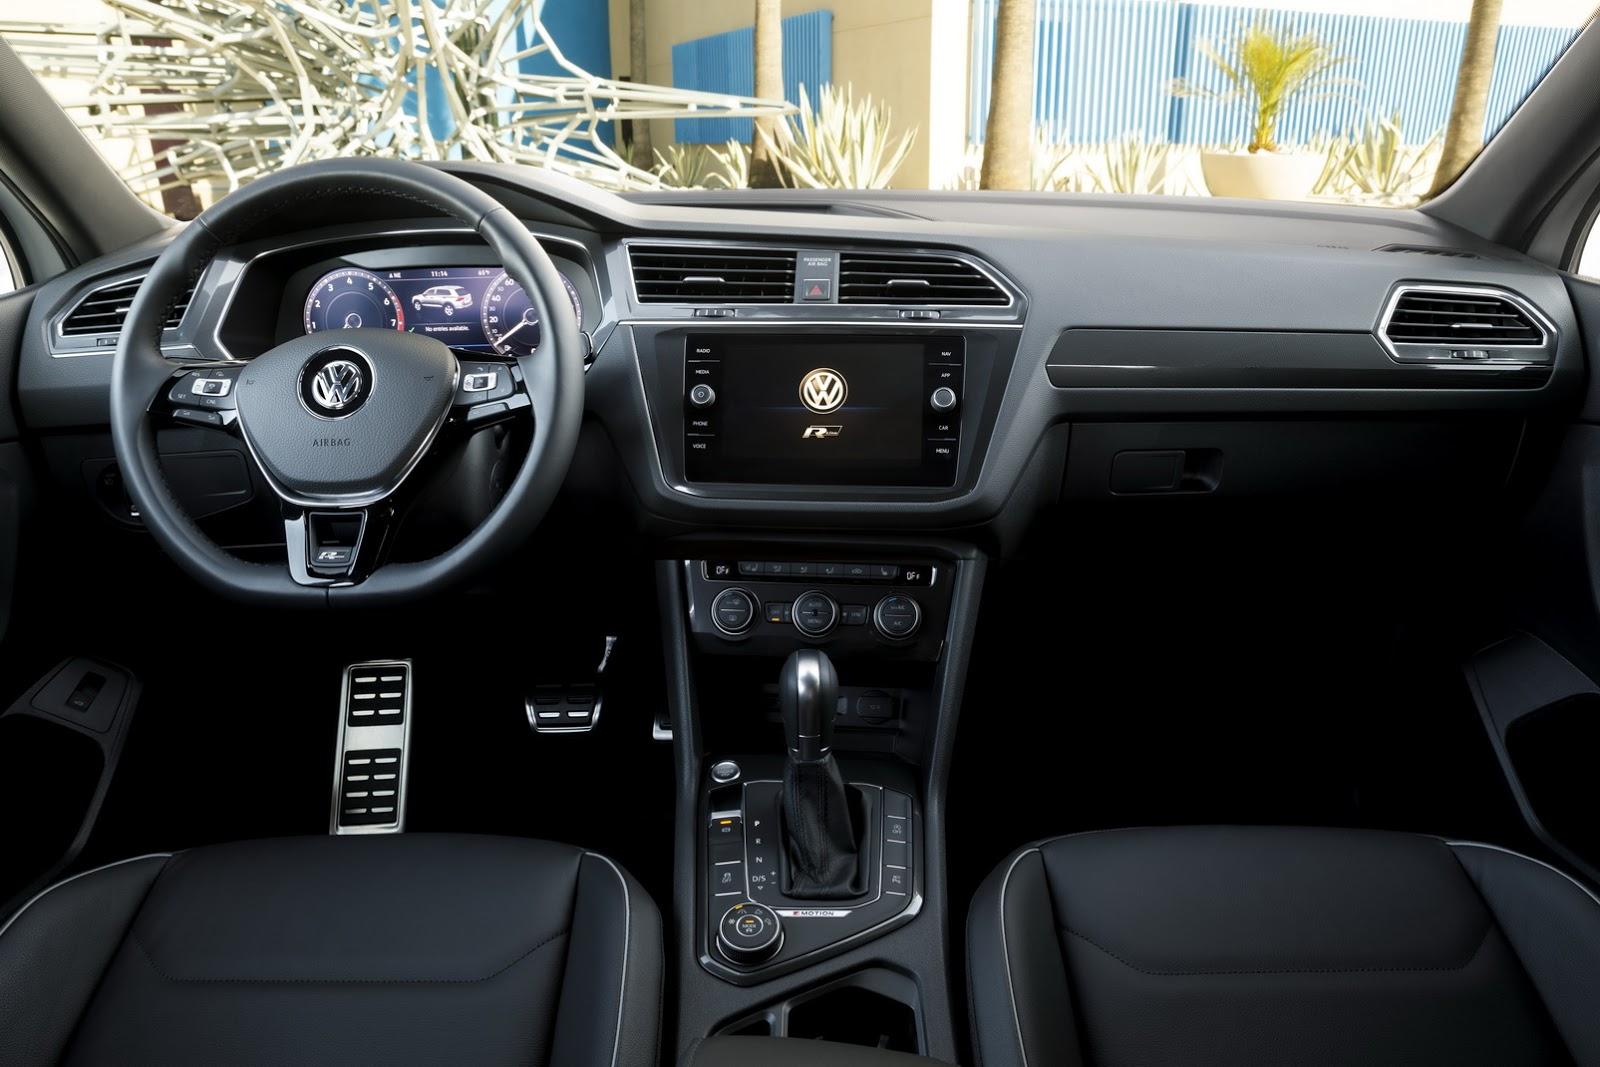 2018 Volkswagen Tiguan Gets R-Line Body Kit in America - autoevolution